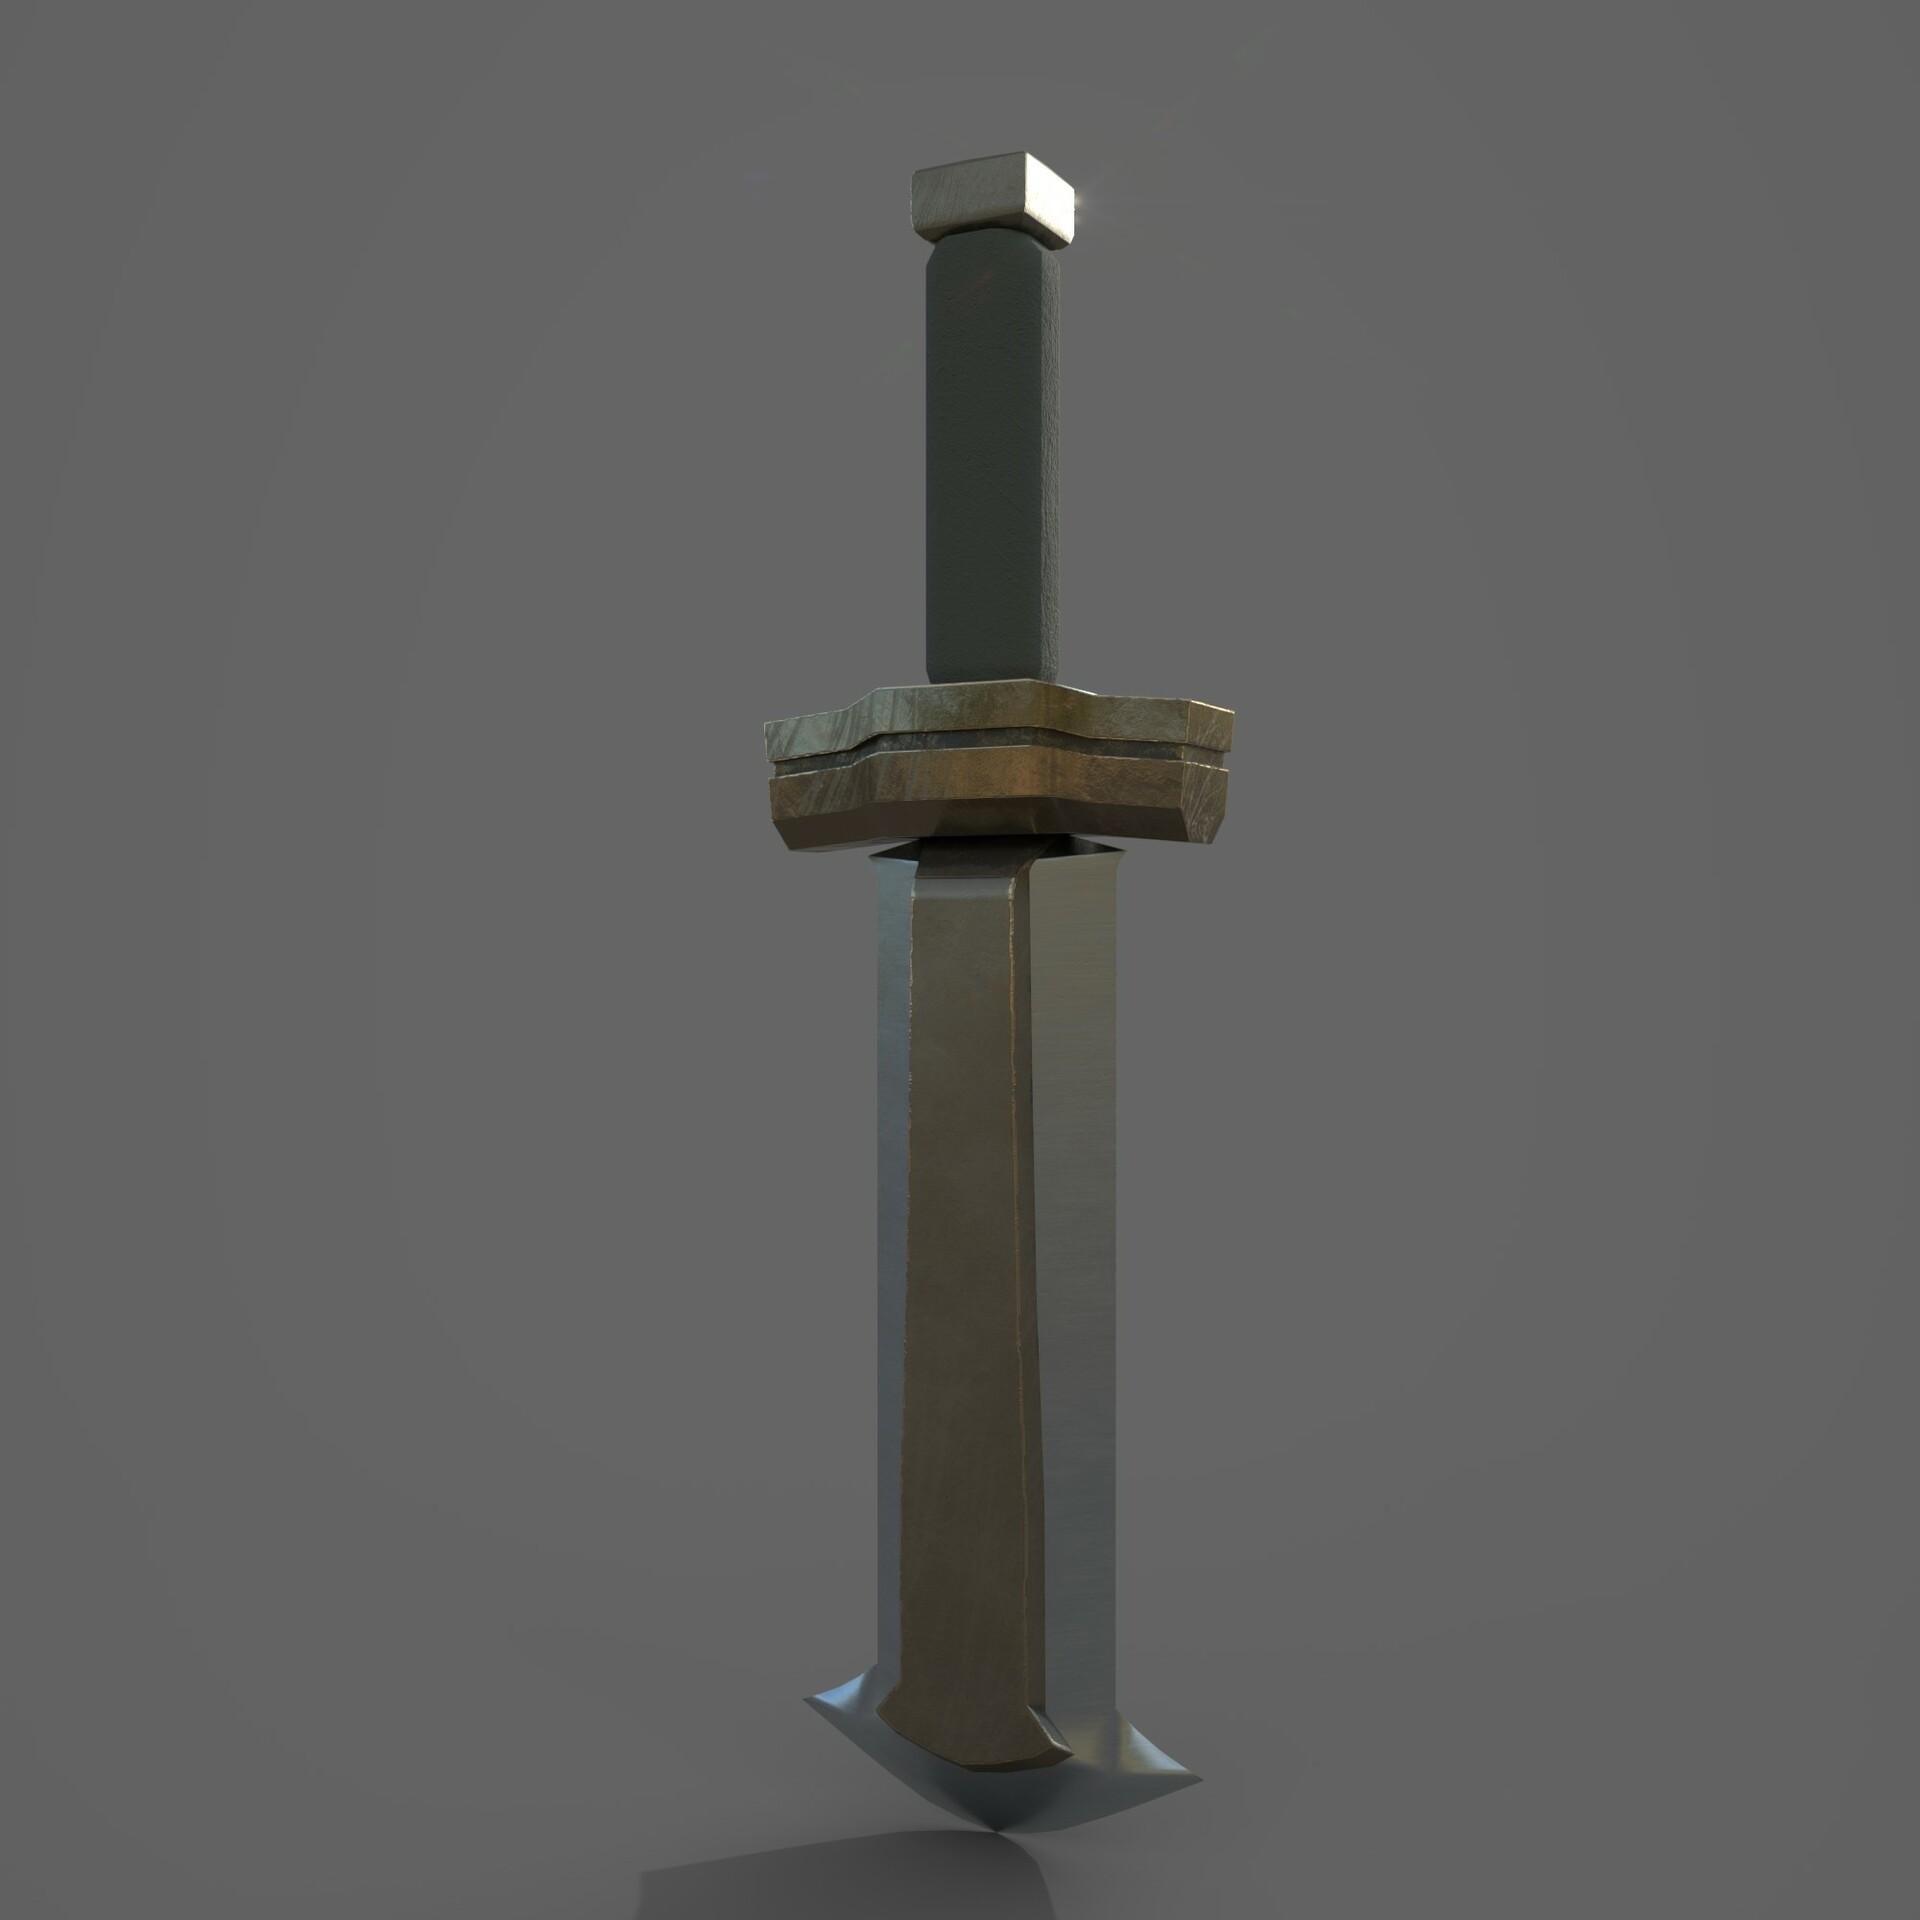 Artstation Hard Surface Modeling Ganondorf Sword Kameron